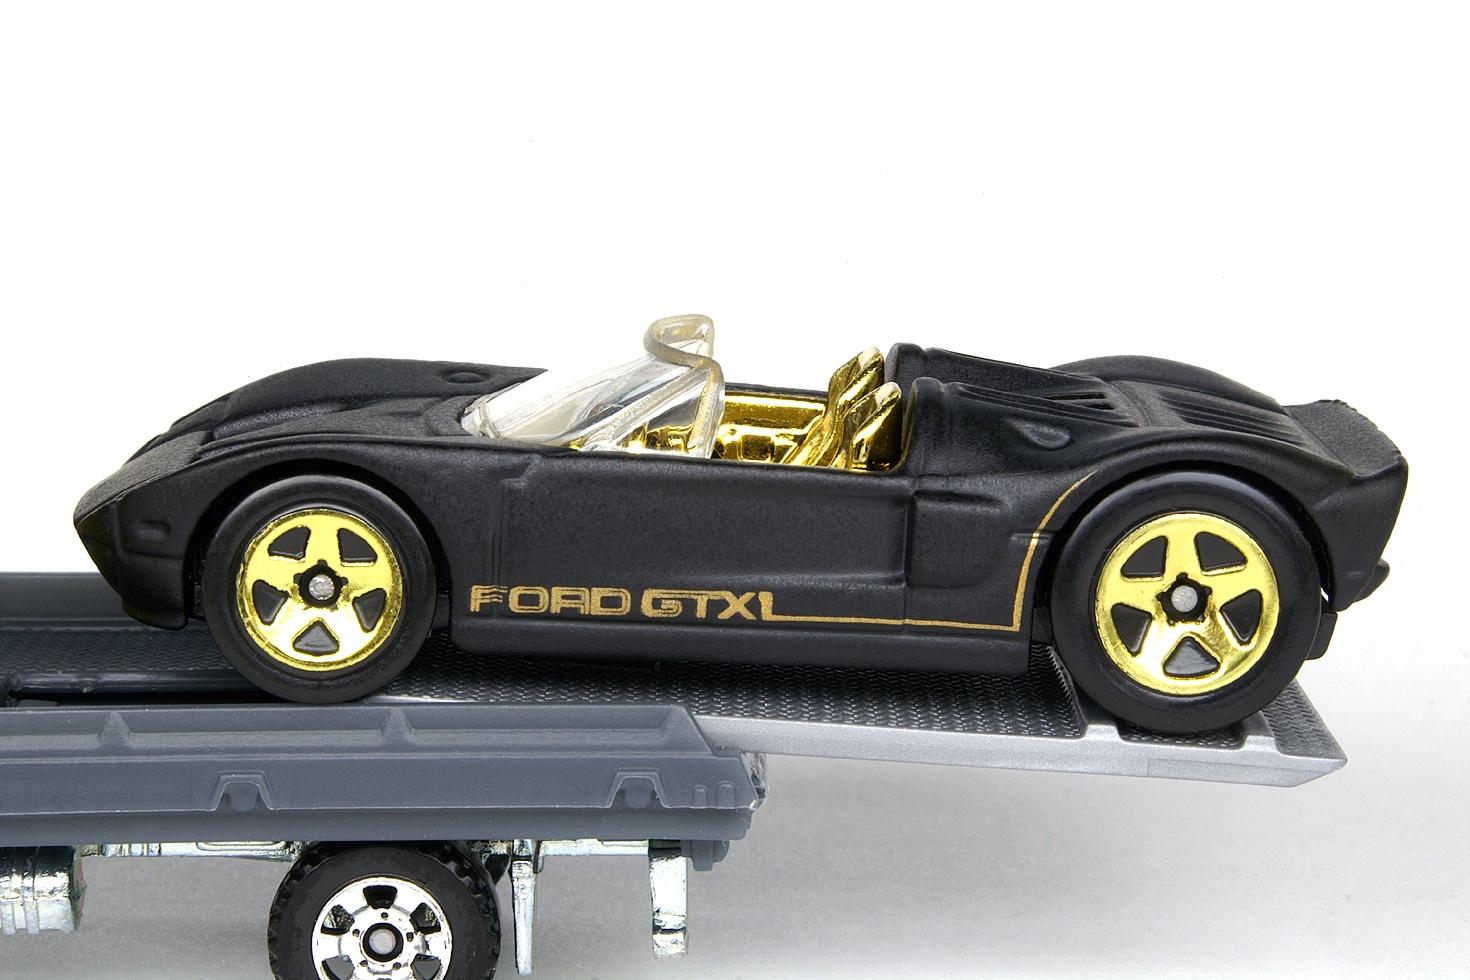 Ford Gtx  Cf Jpg